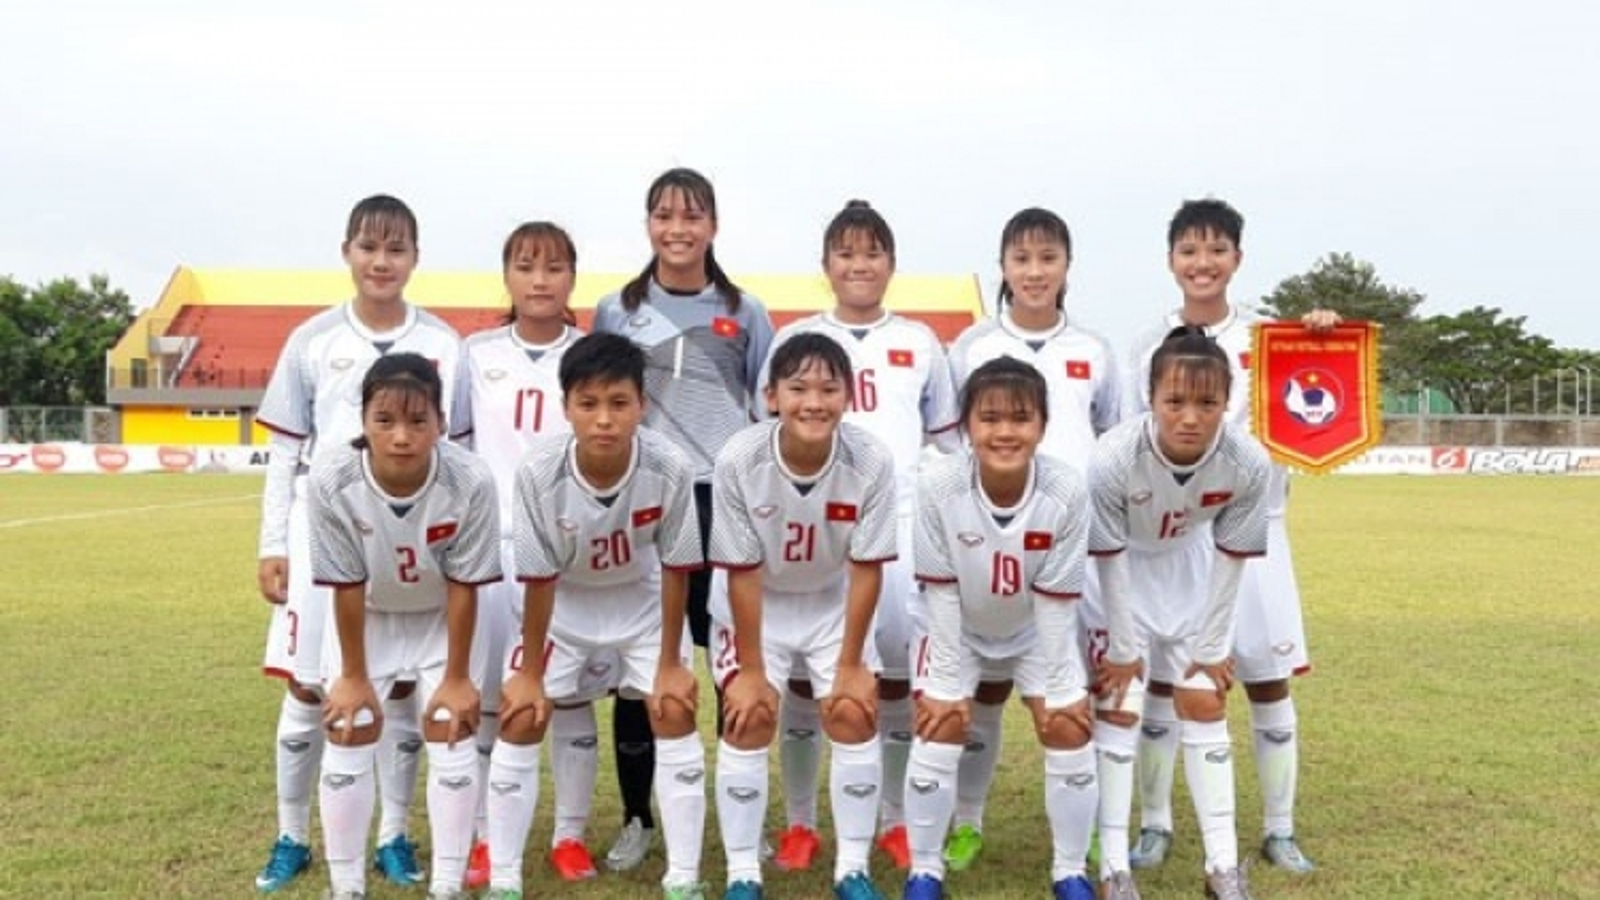 Vietnam to meet Laos in third-place match at AFF U16 girls' champs